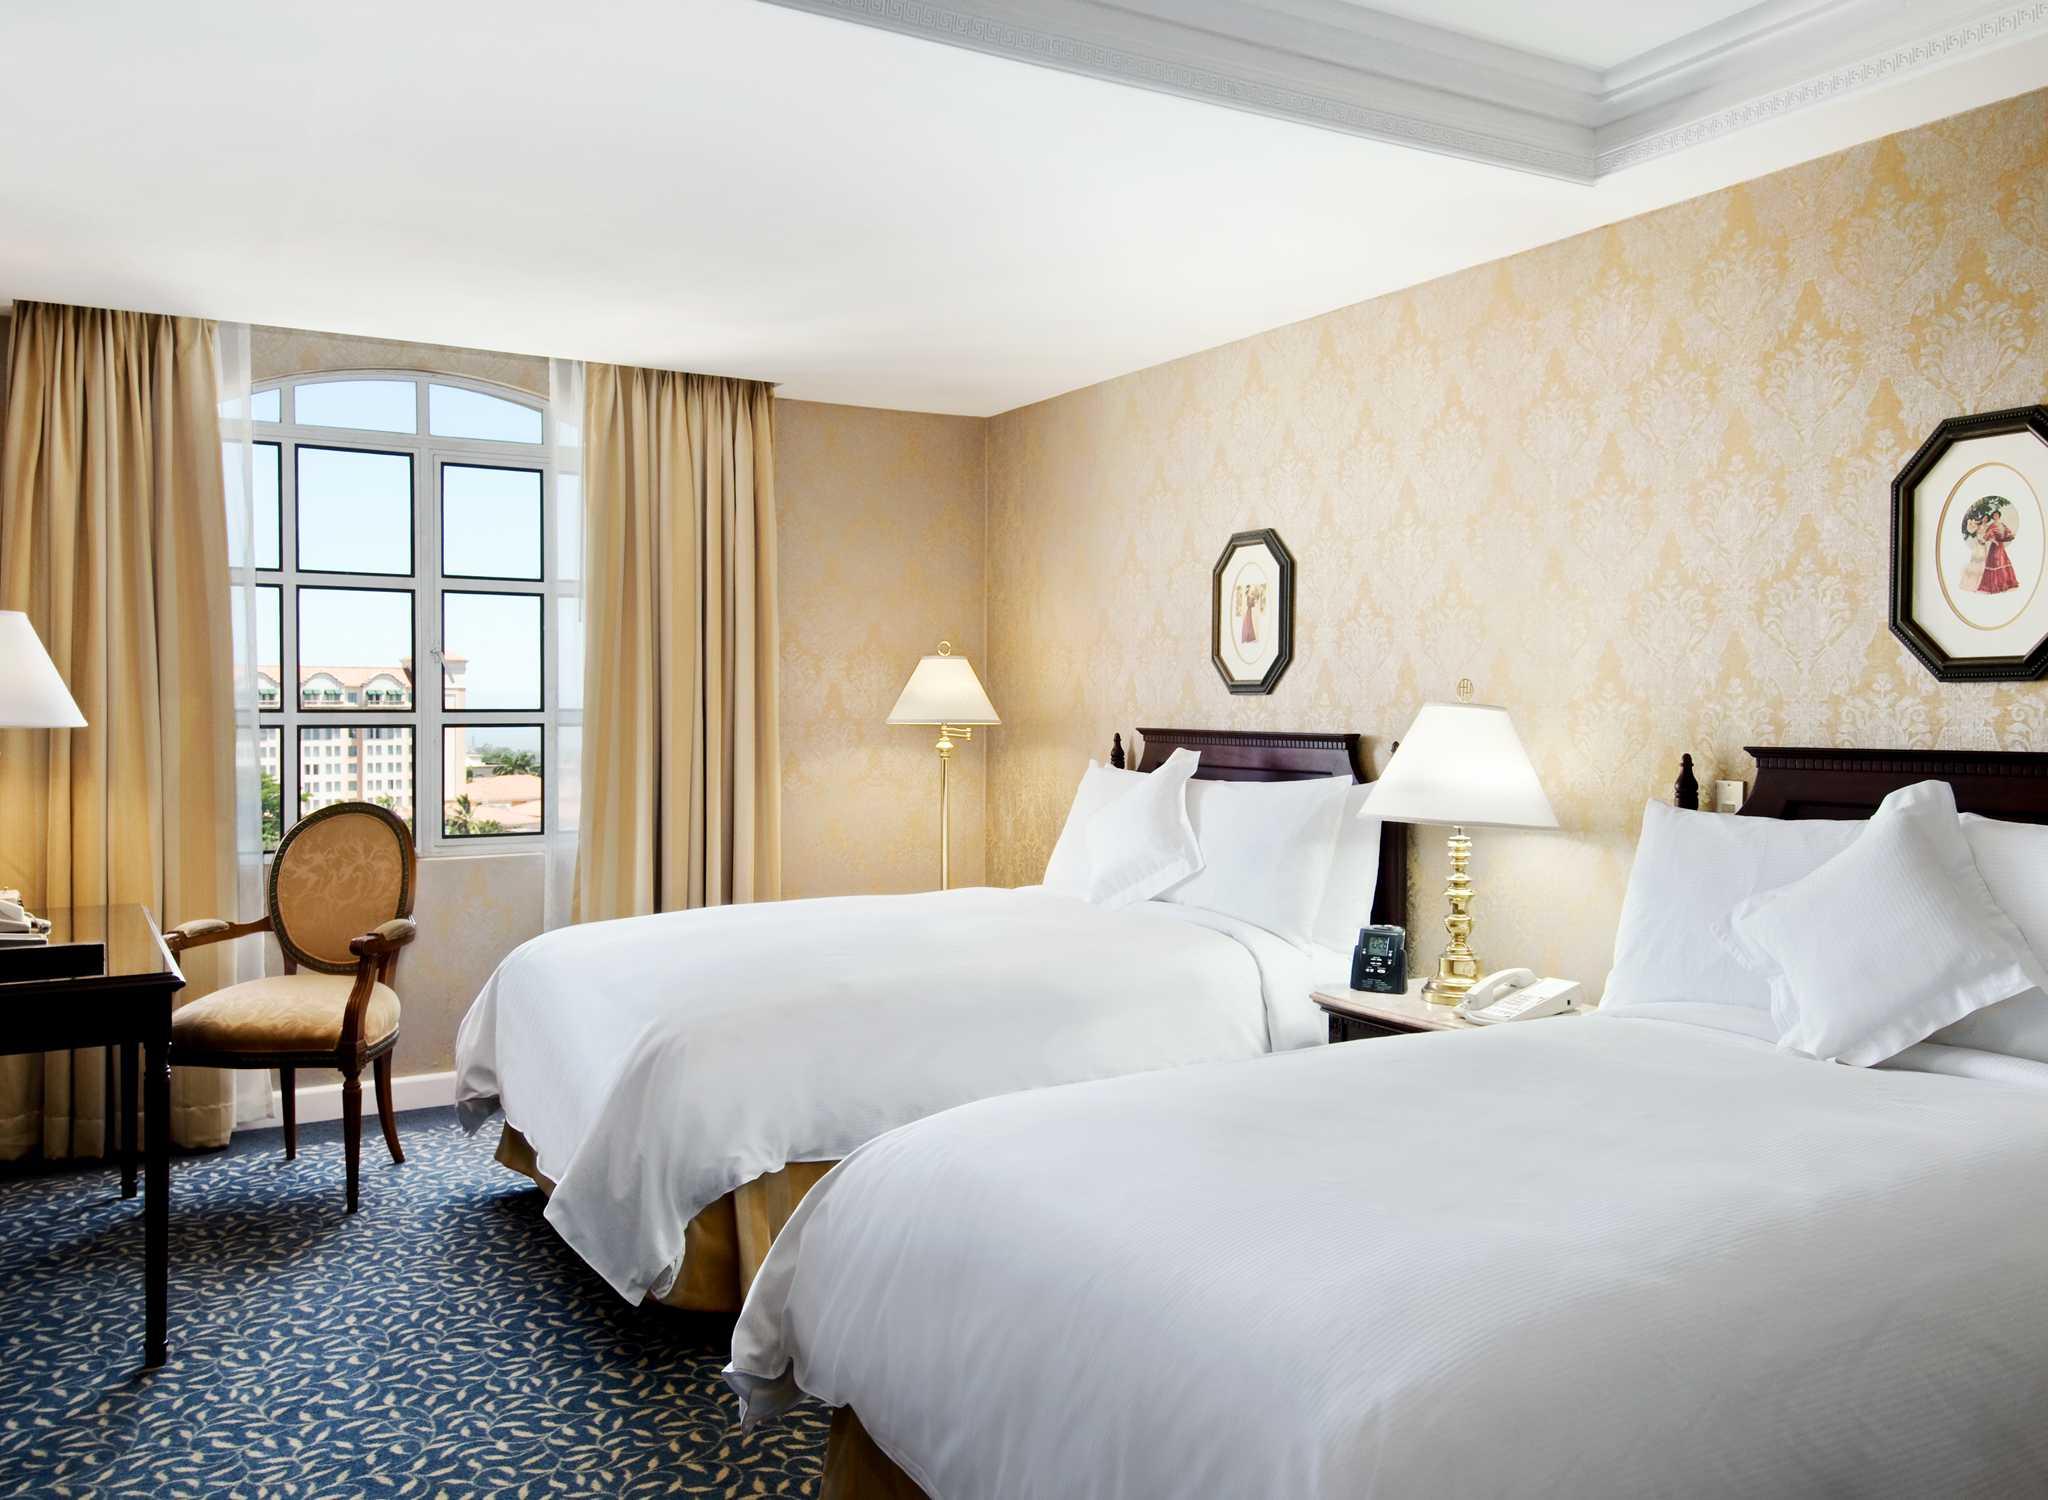 Hotel Hilton Princess Managua Nicaragua